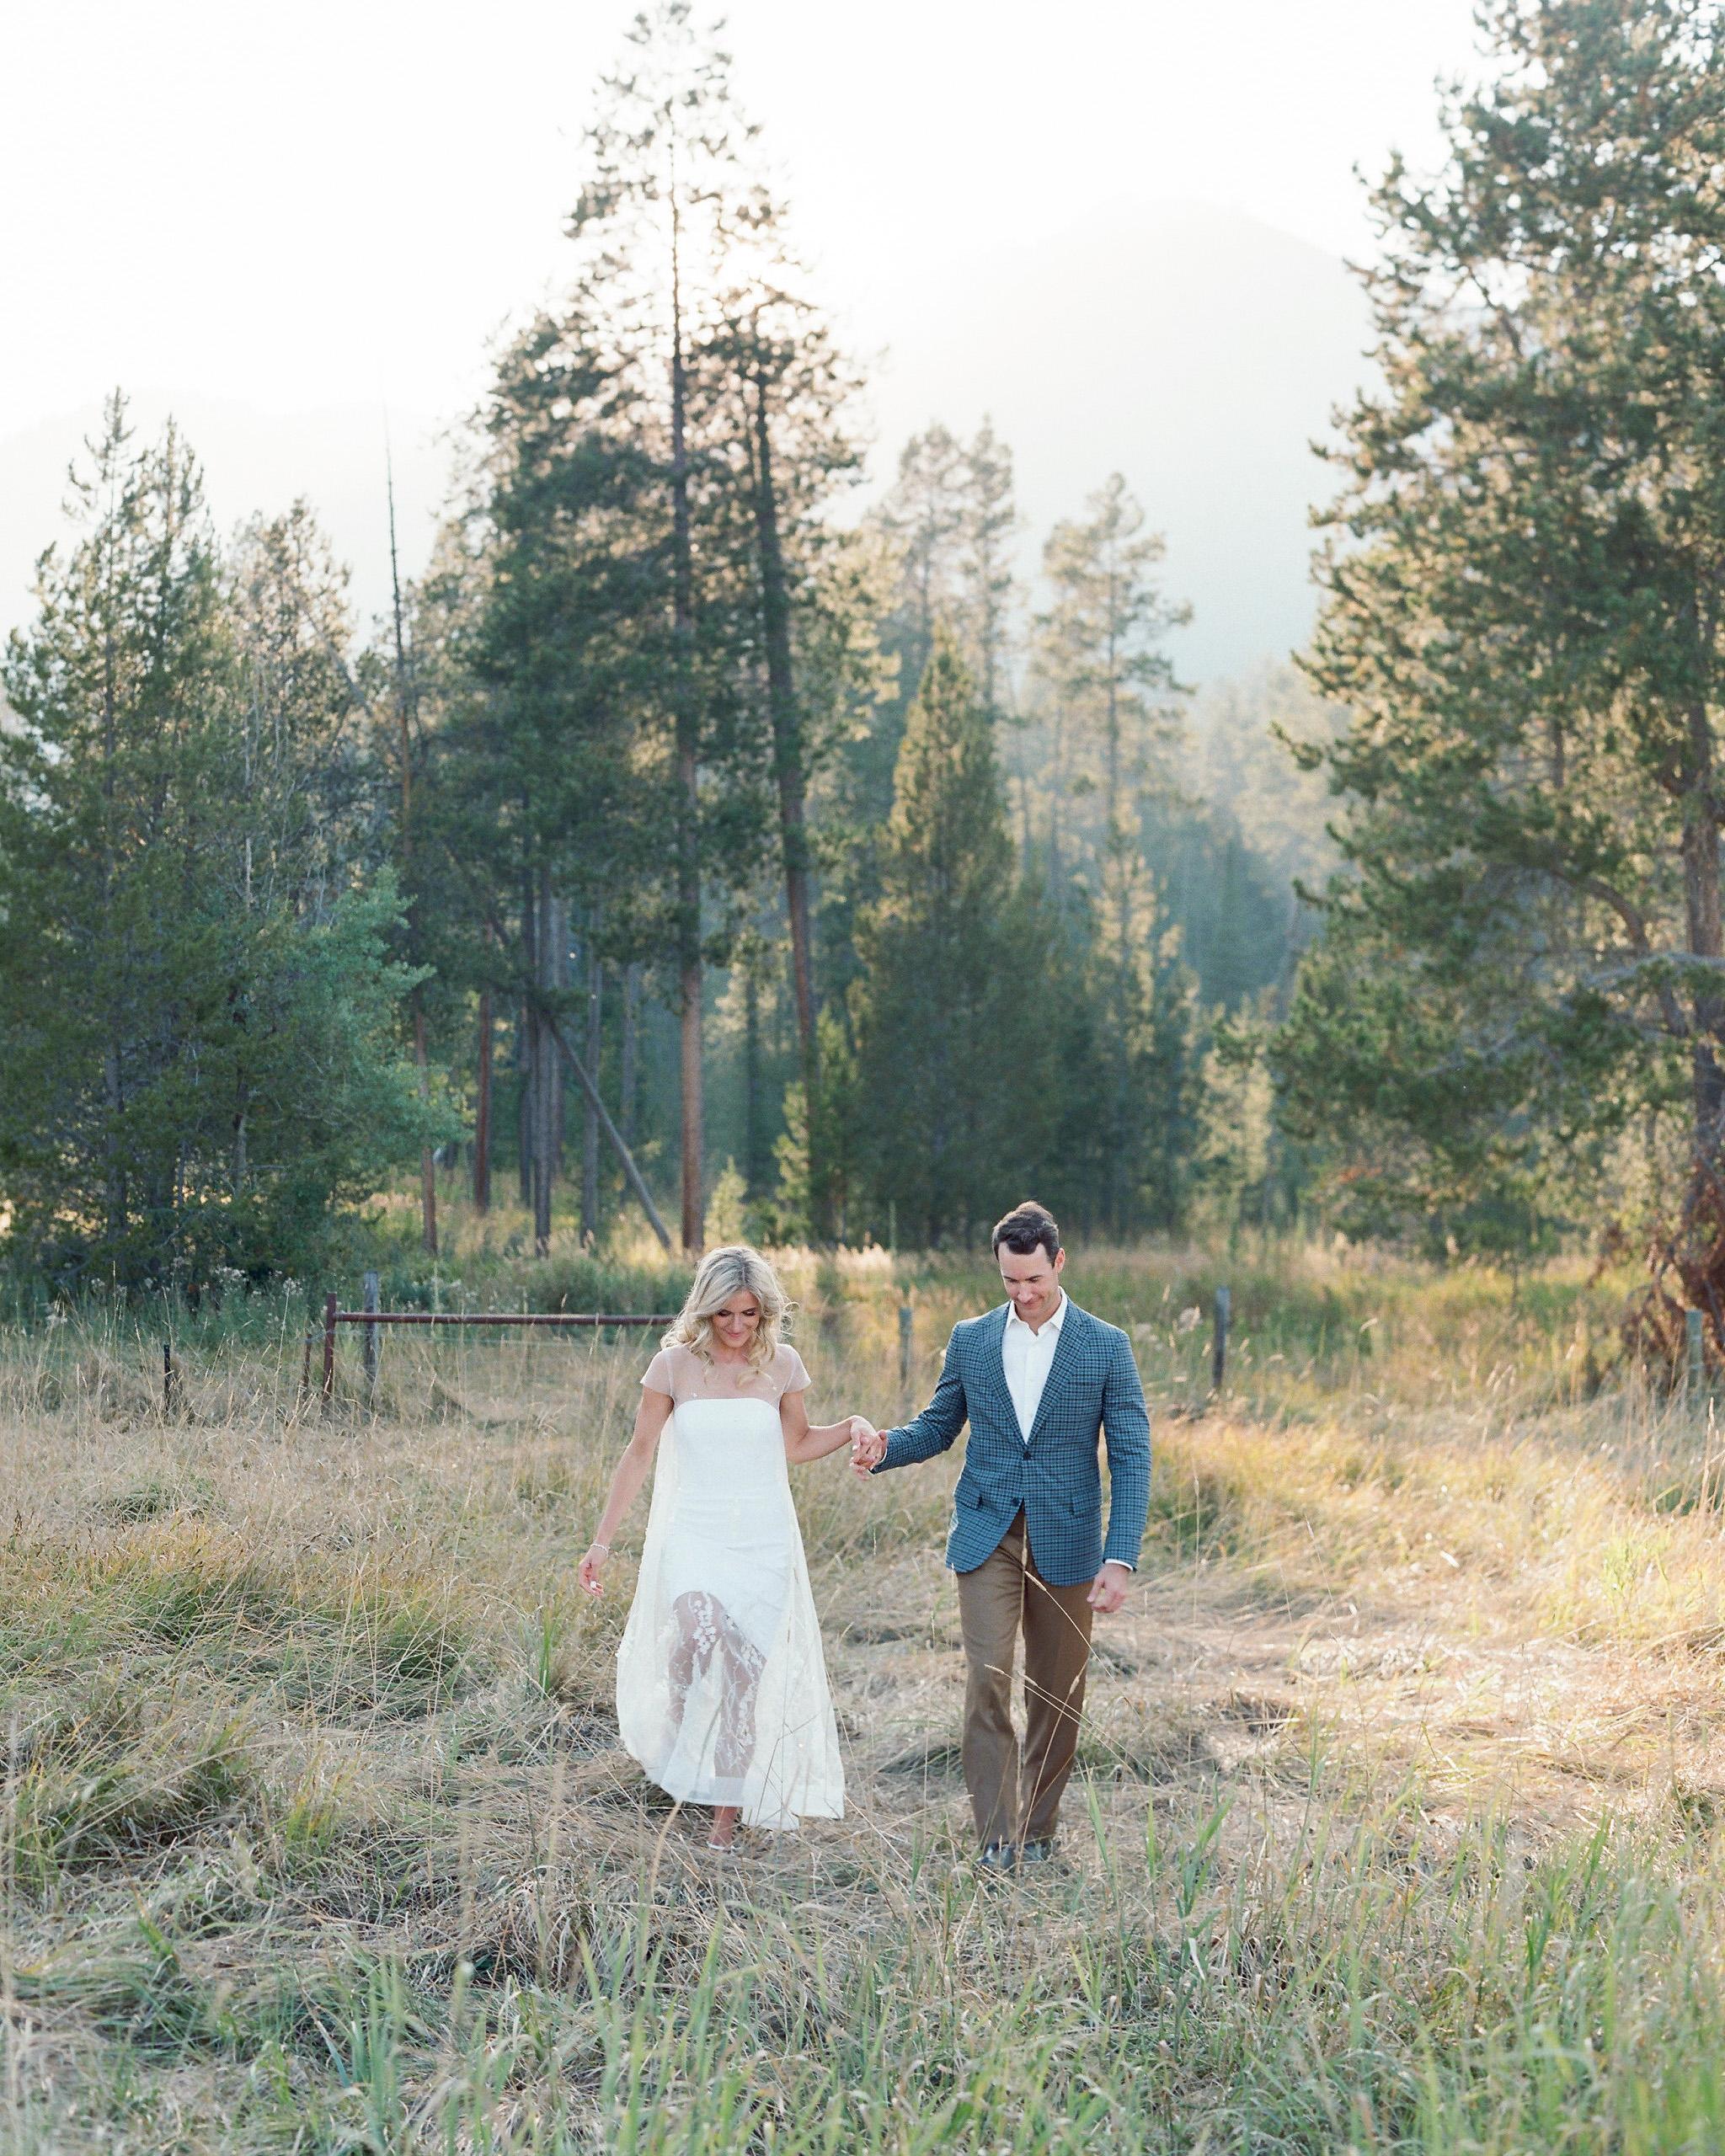 bride groom walking in wooded grass area